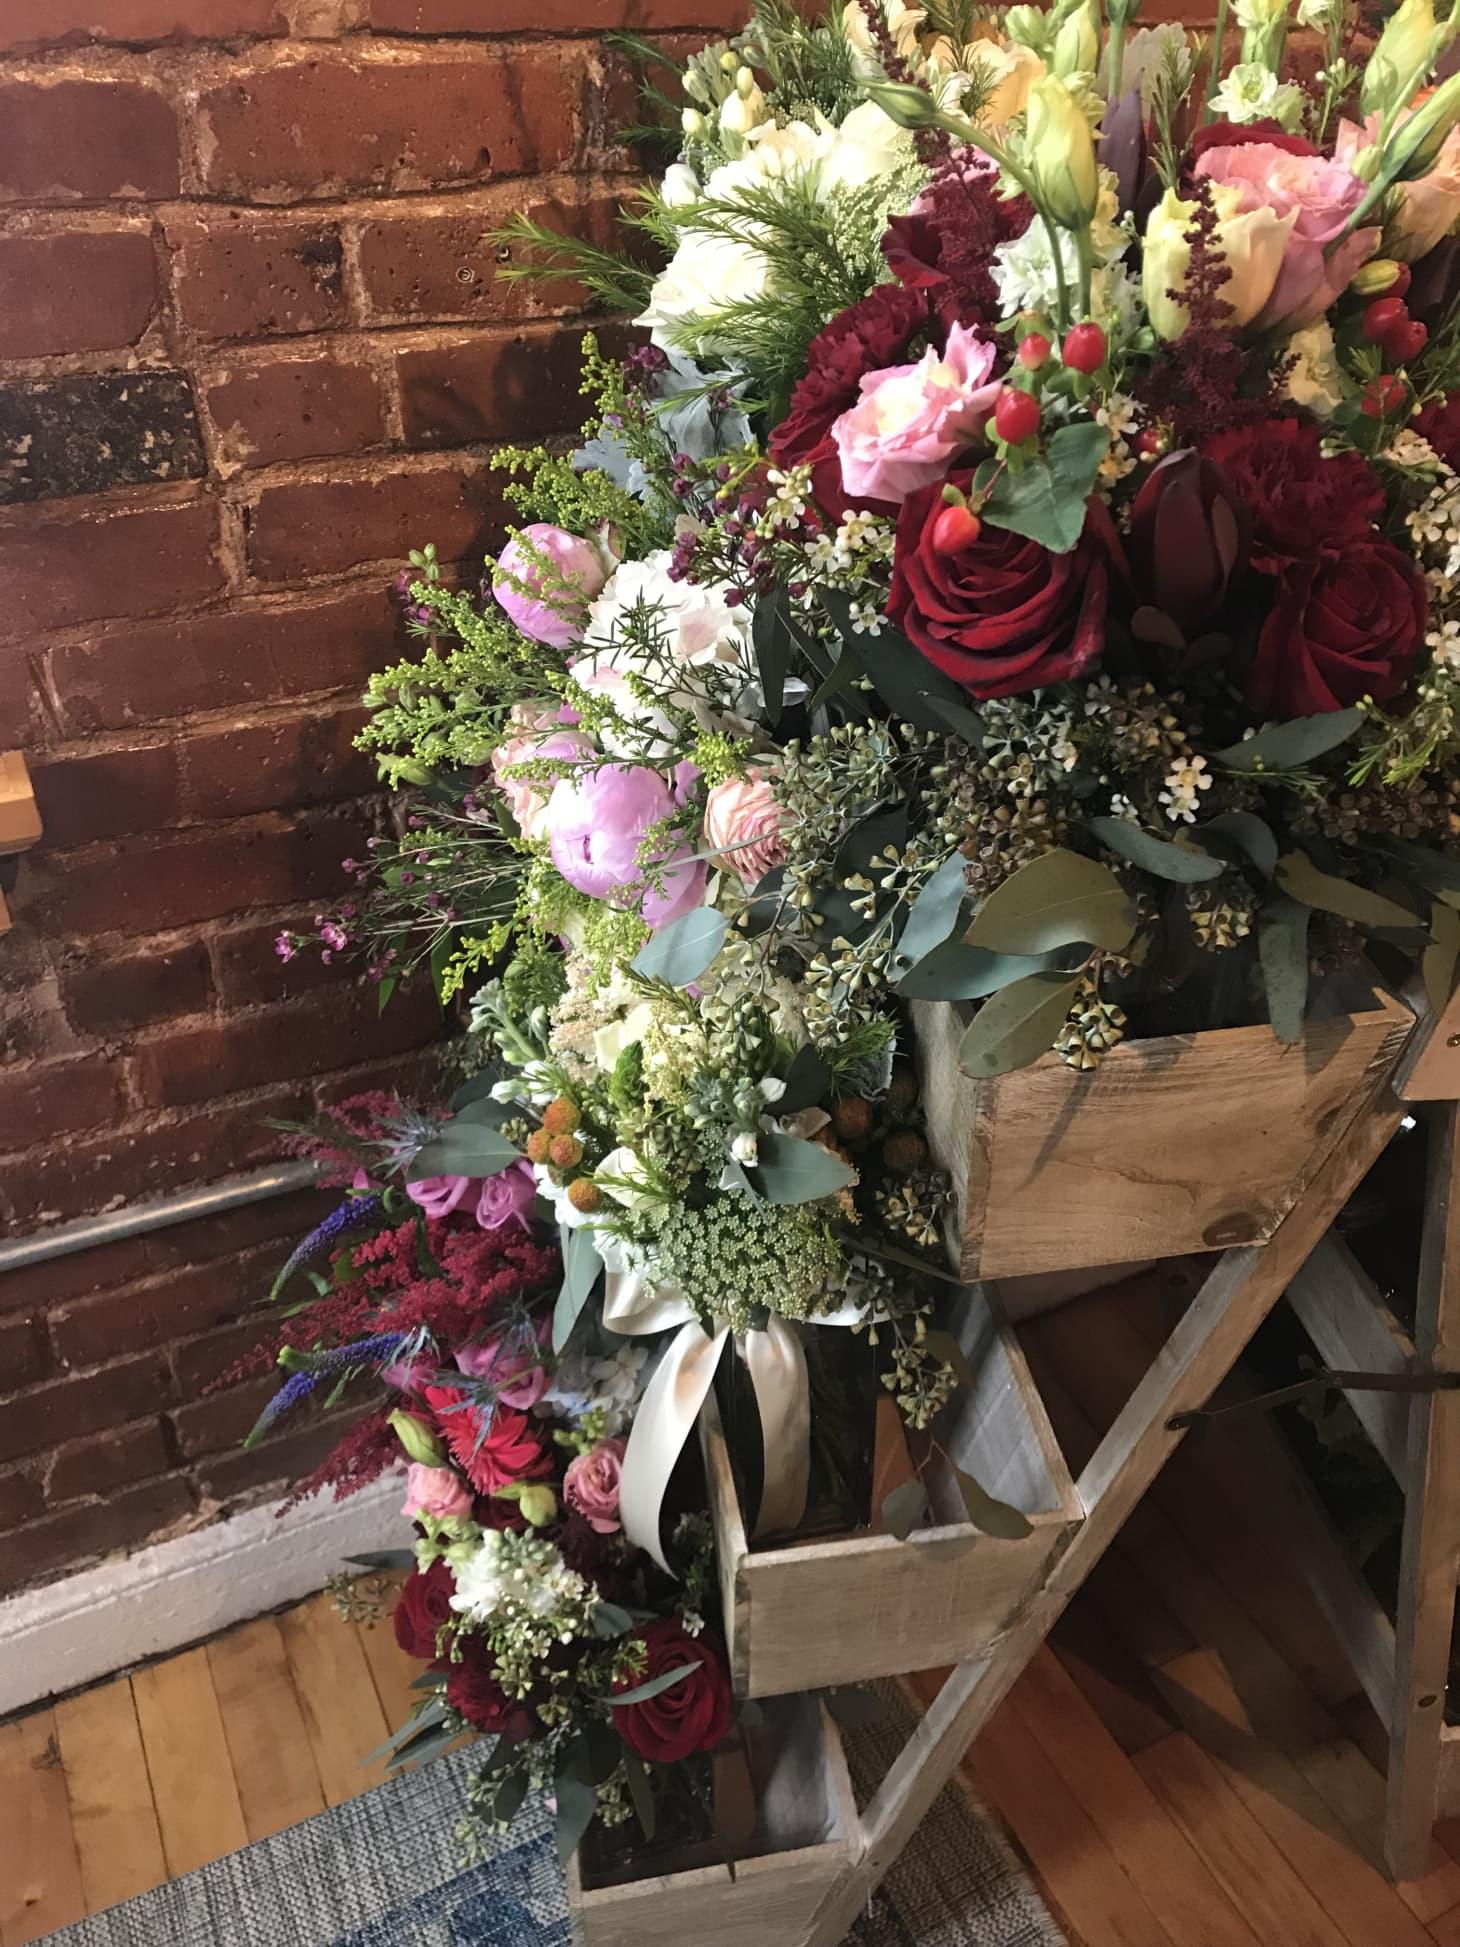 Costco Flowers Wedding.Costco Sams Club Flowers Cheap Wedding Packages Kitchn